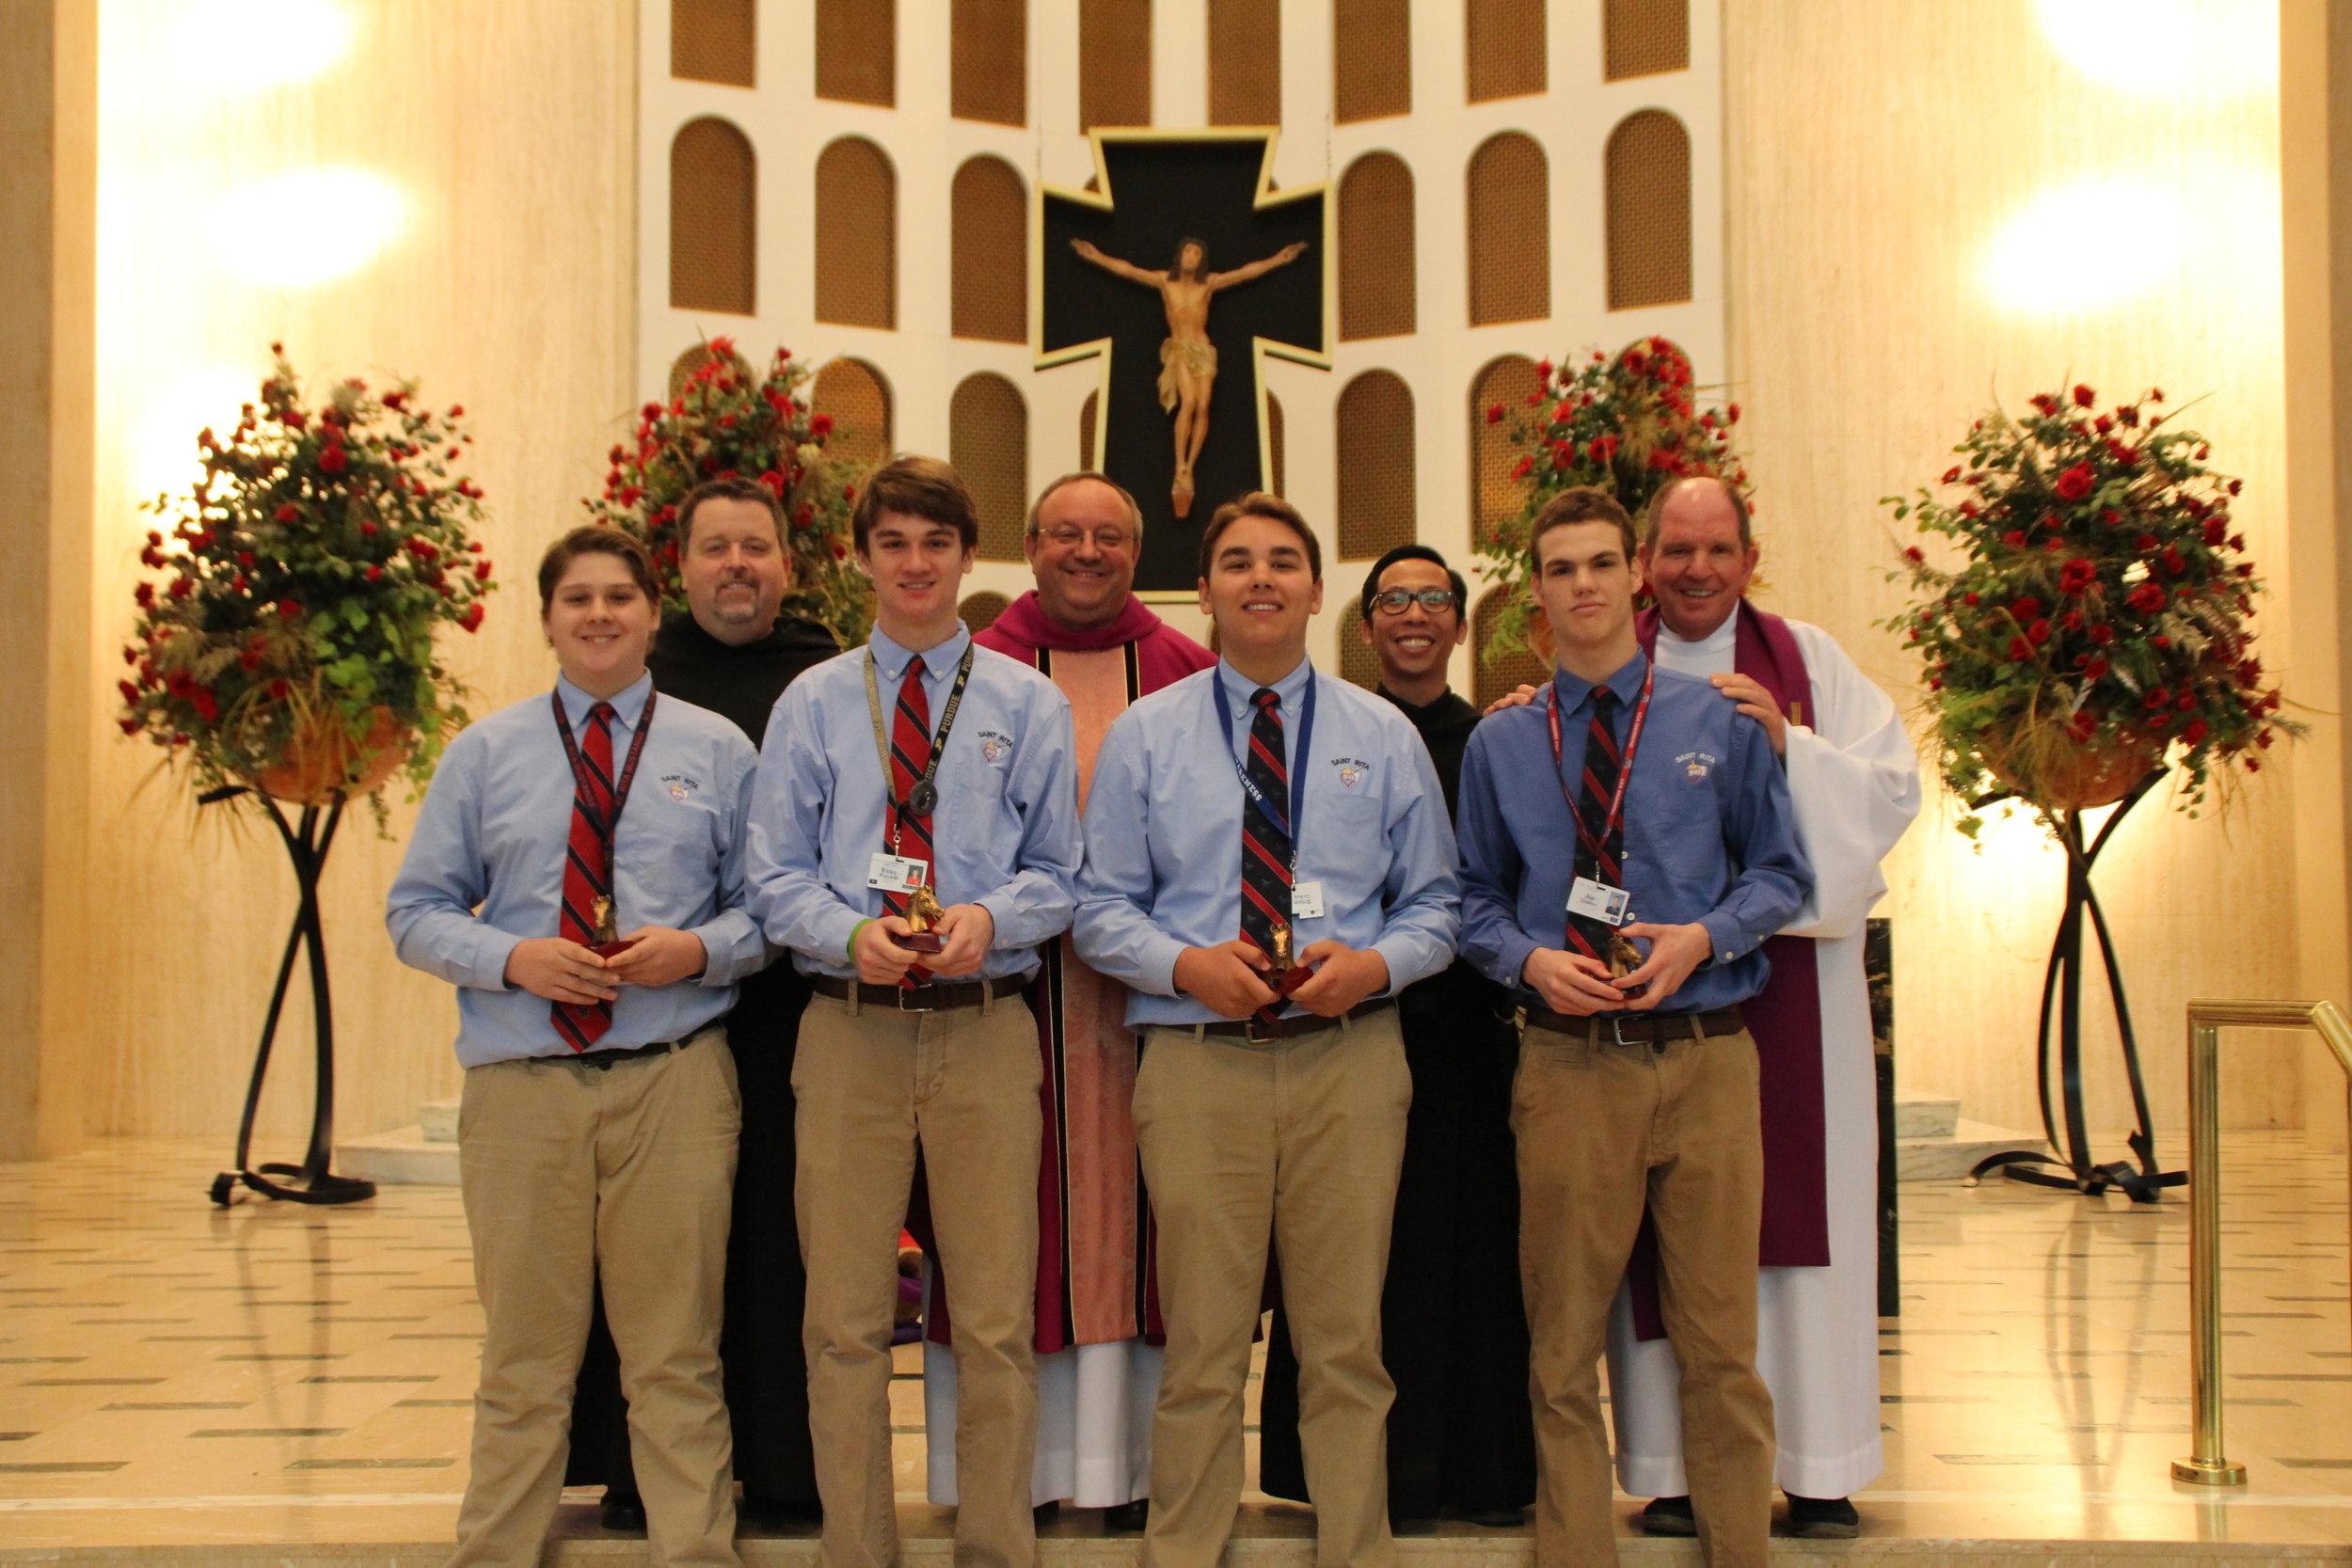 Pictured left to right: Matthew Beam, Fr. Tom McCarthy, OSA,Evan Wojcicki, Fr. Bernie Scianna, OSA, Brian Gralek, Fr. Richie Mercando, OSA, Joe Qualter and Fr. Paul Galetto, OSA. (Not pictured: MIchael Jurek)